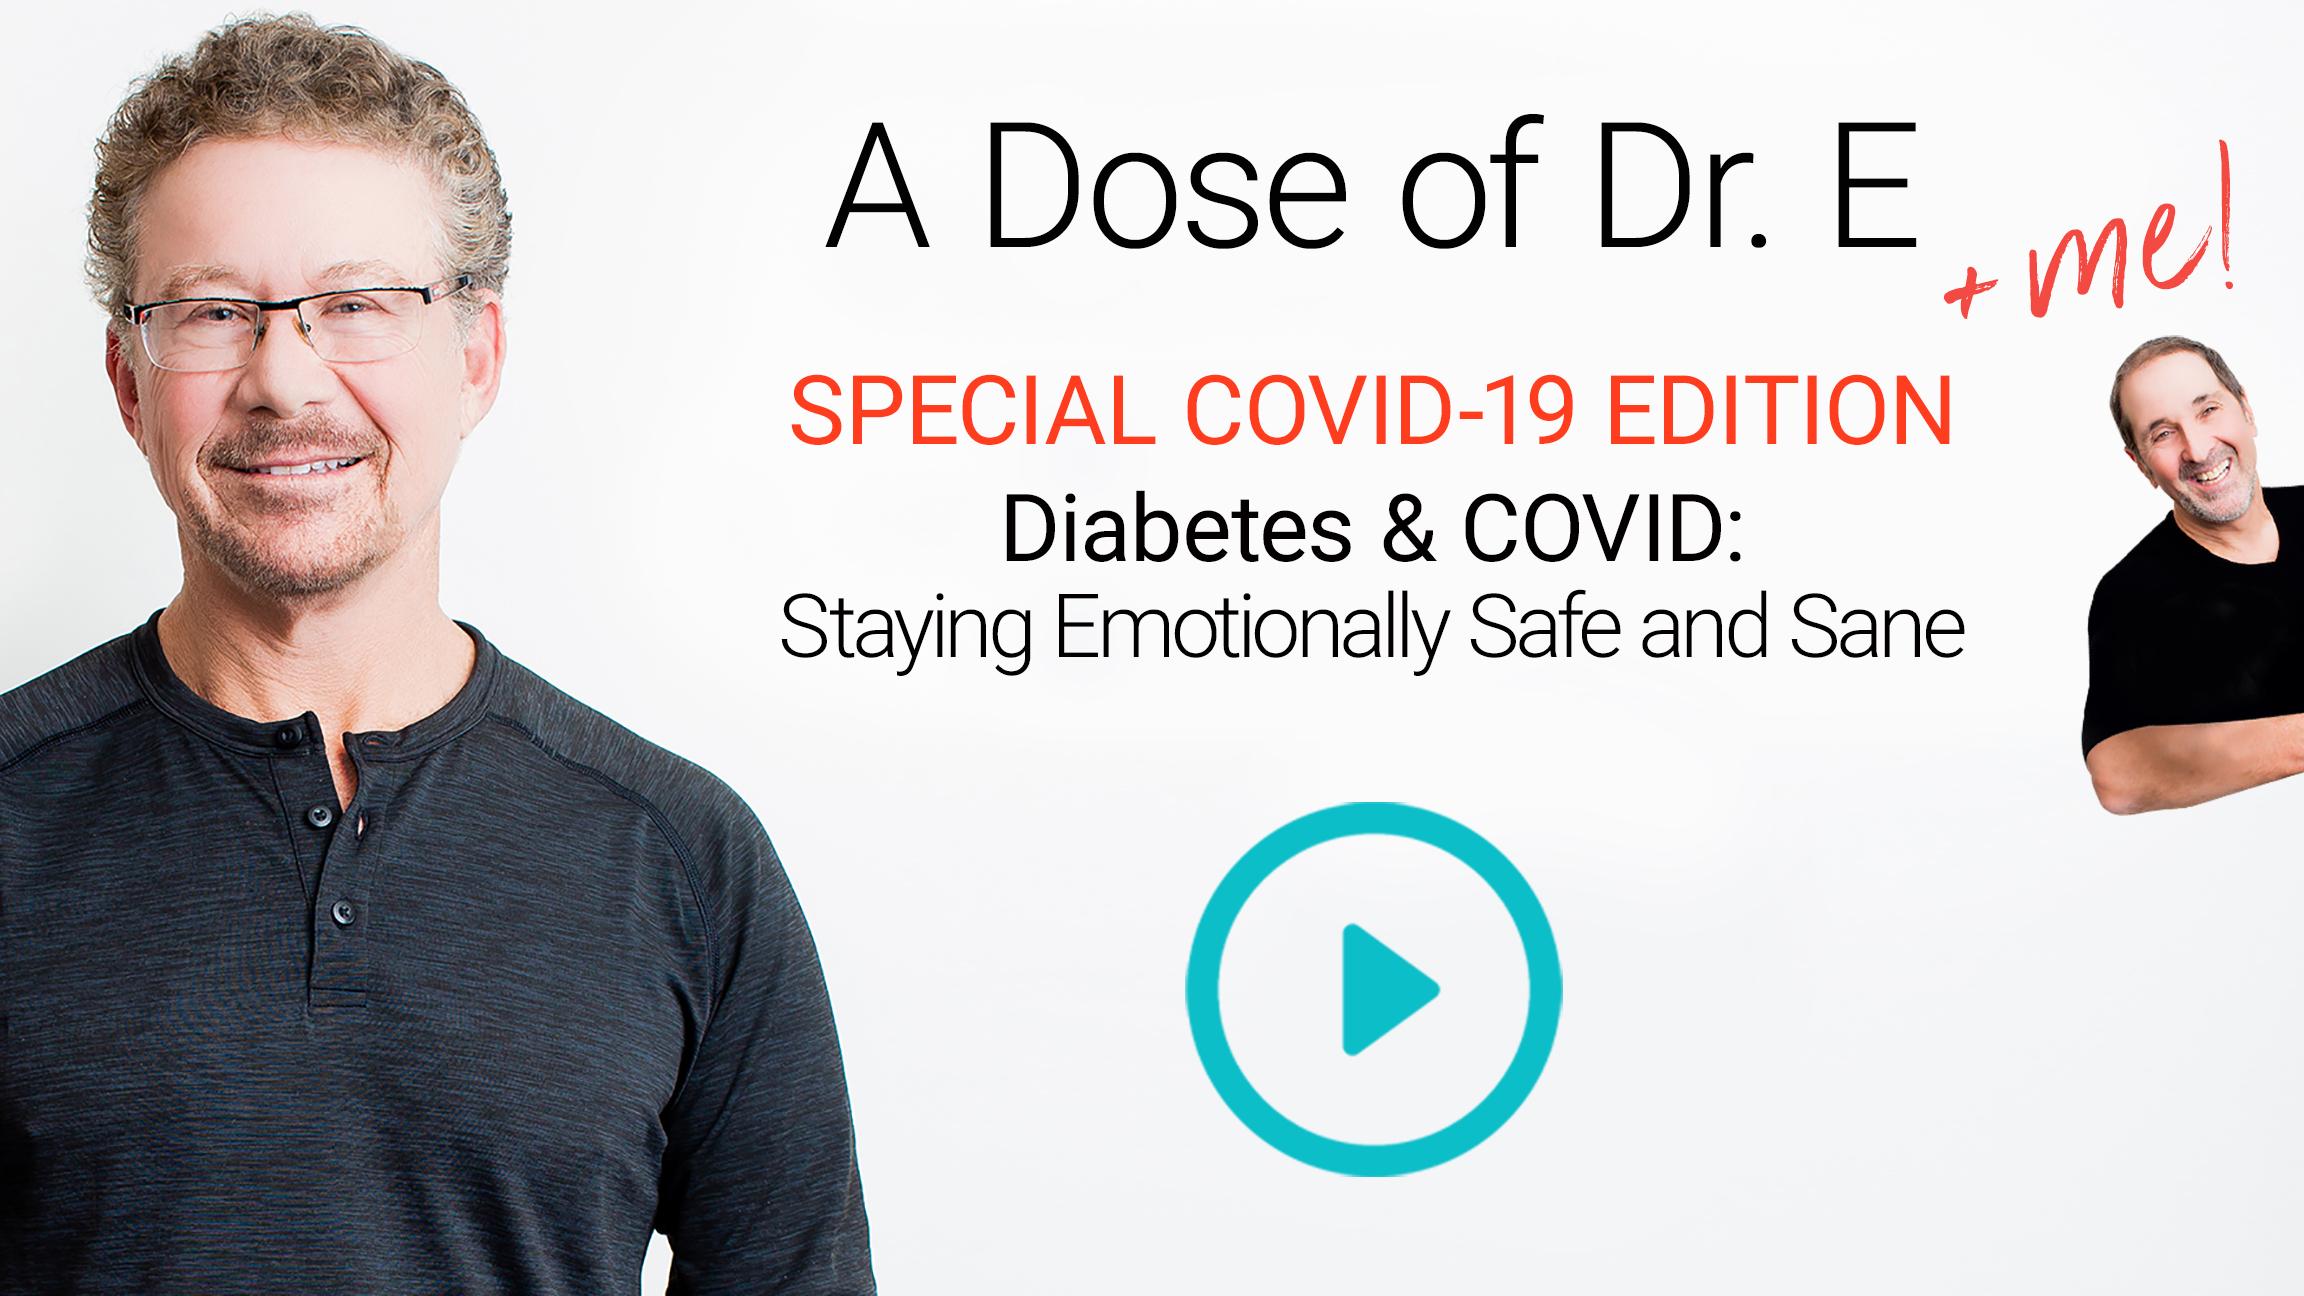 Diabetes & COVID-19: Staying Emotionally Safe and Sane